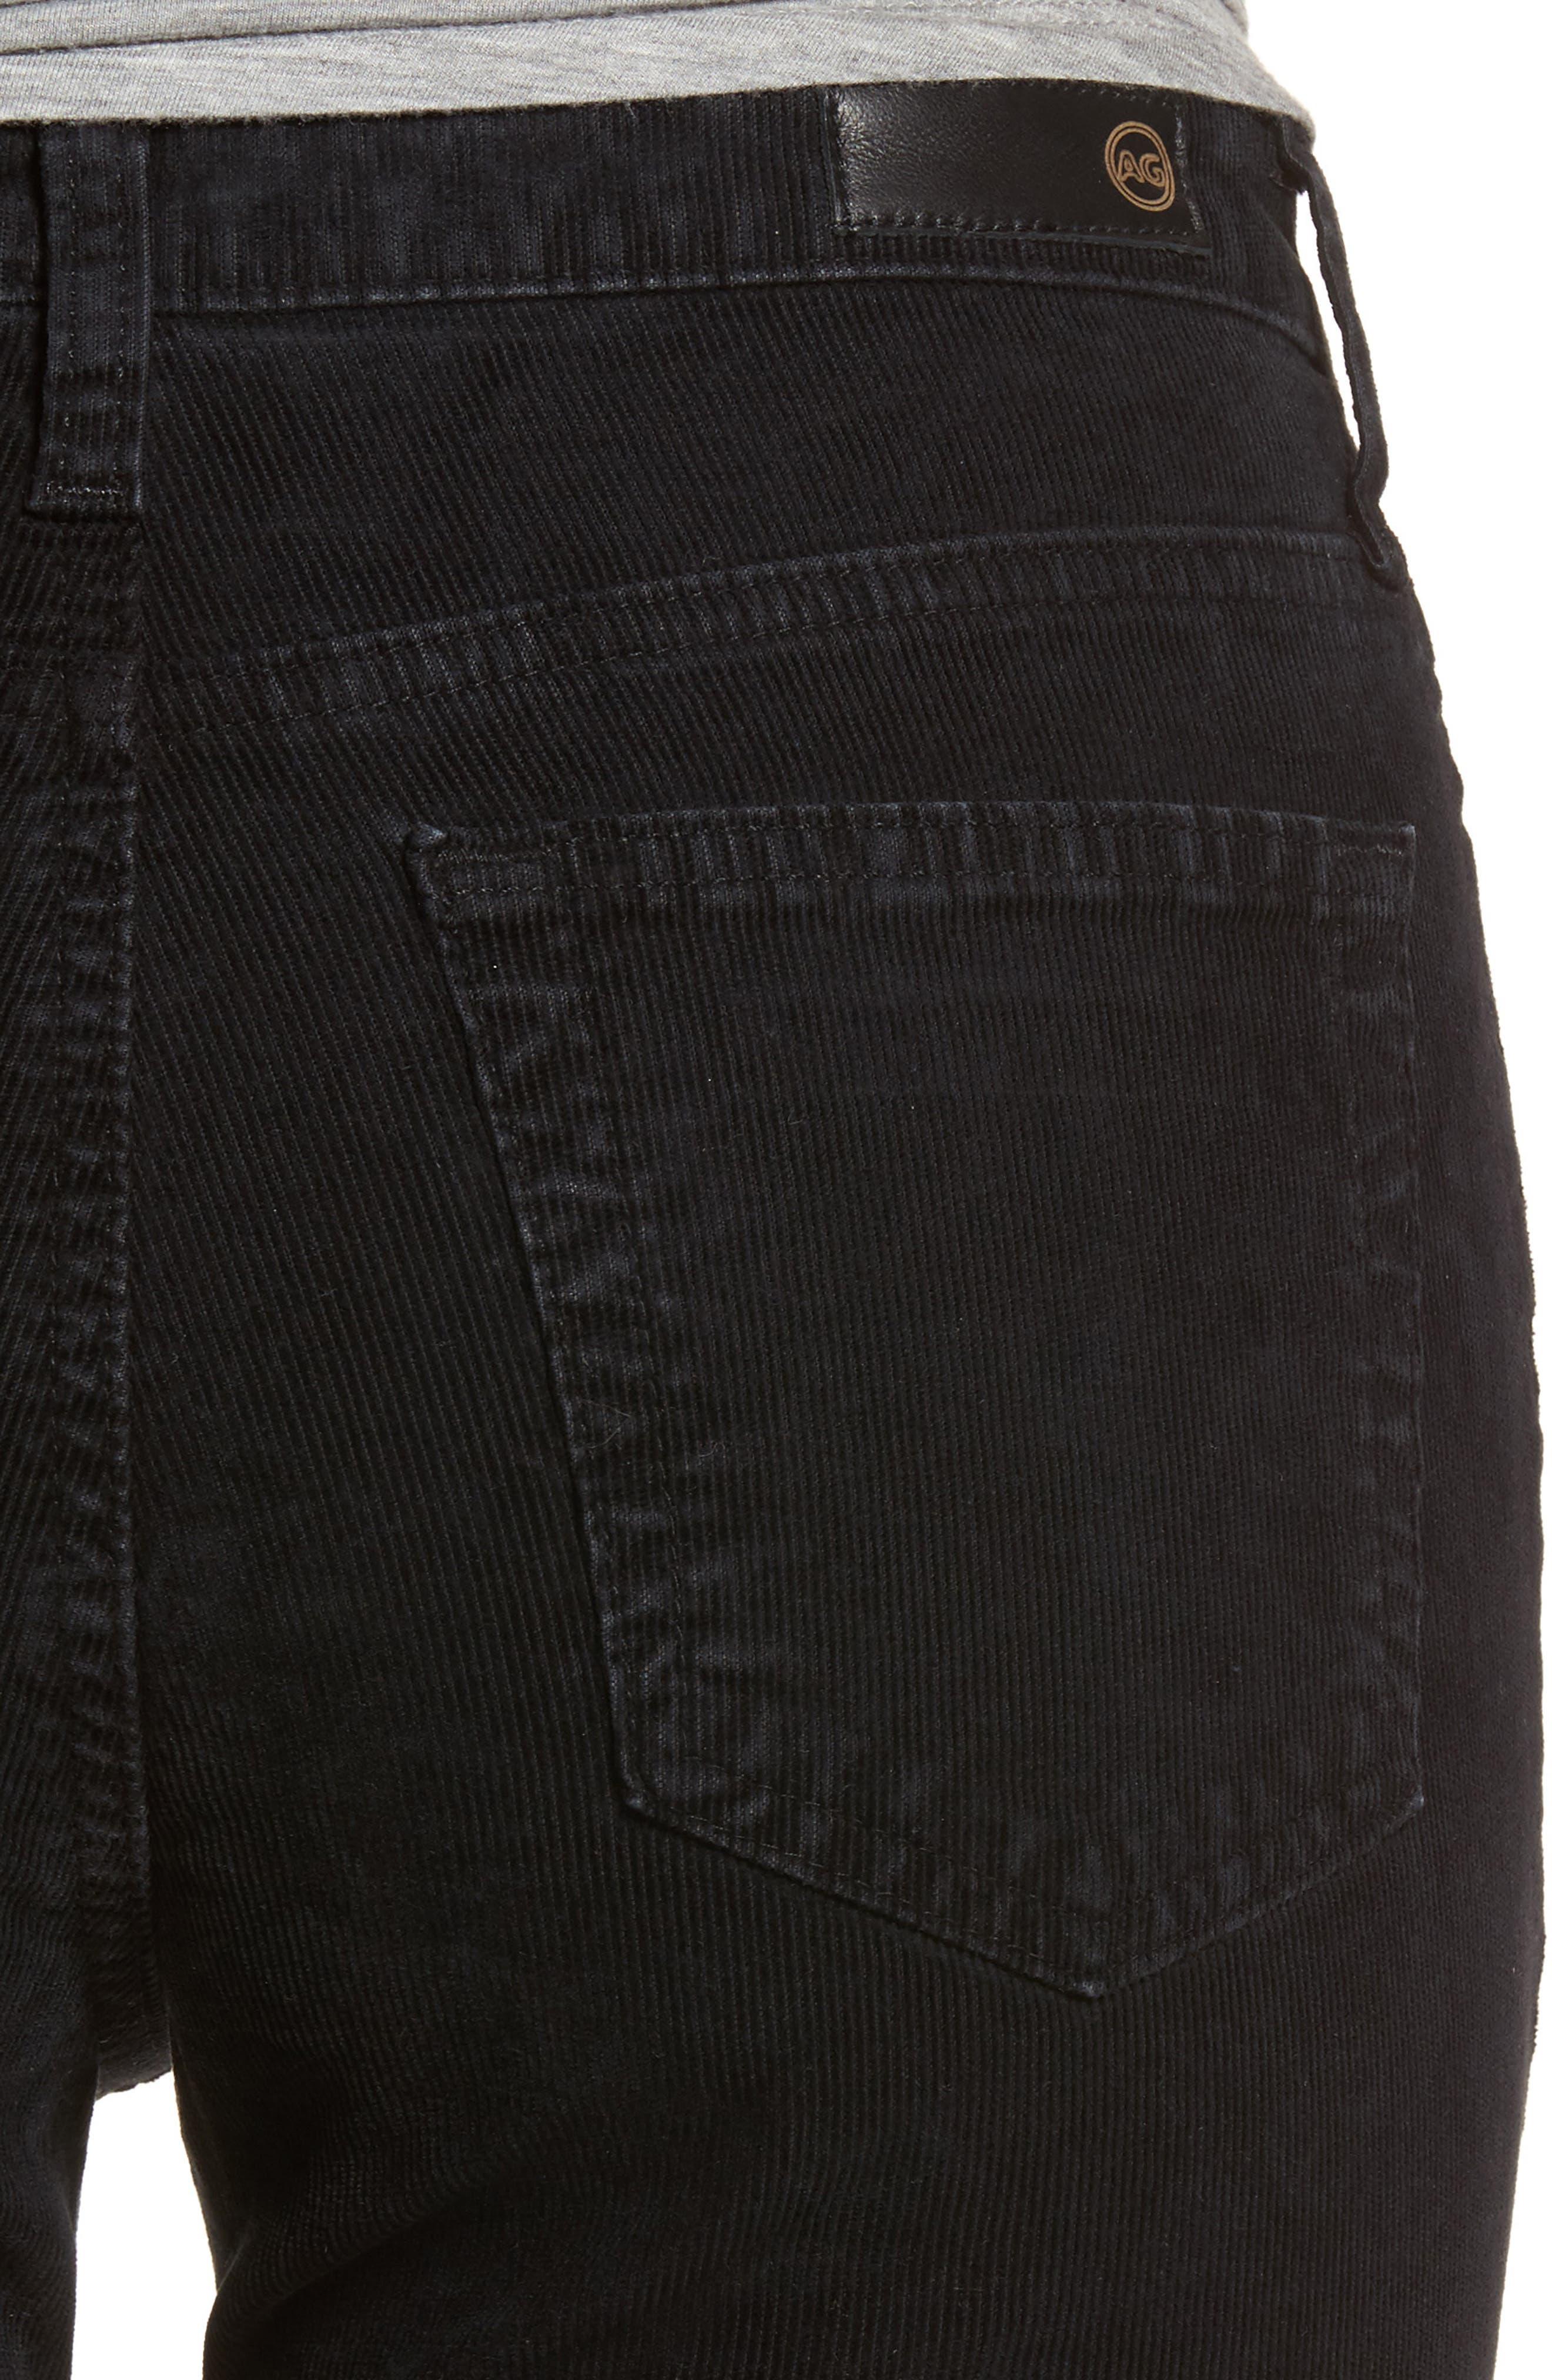 Isabelle High Waist Corduroy Jeans,                             Alternate thumbnail 4, color,